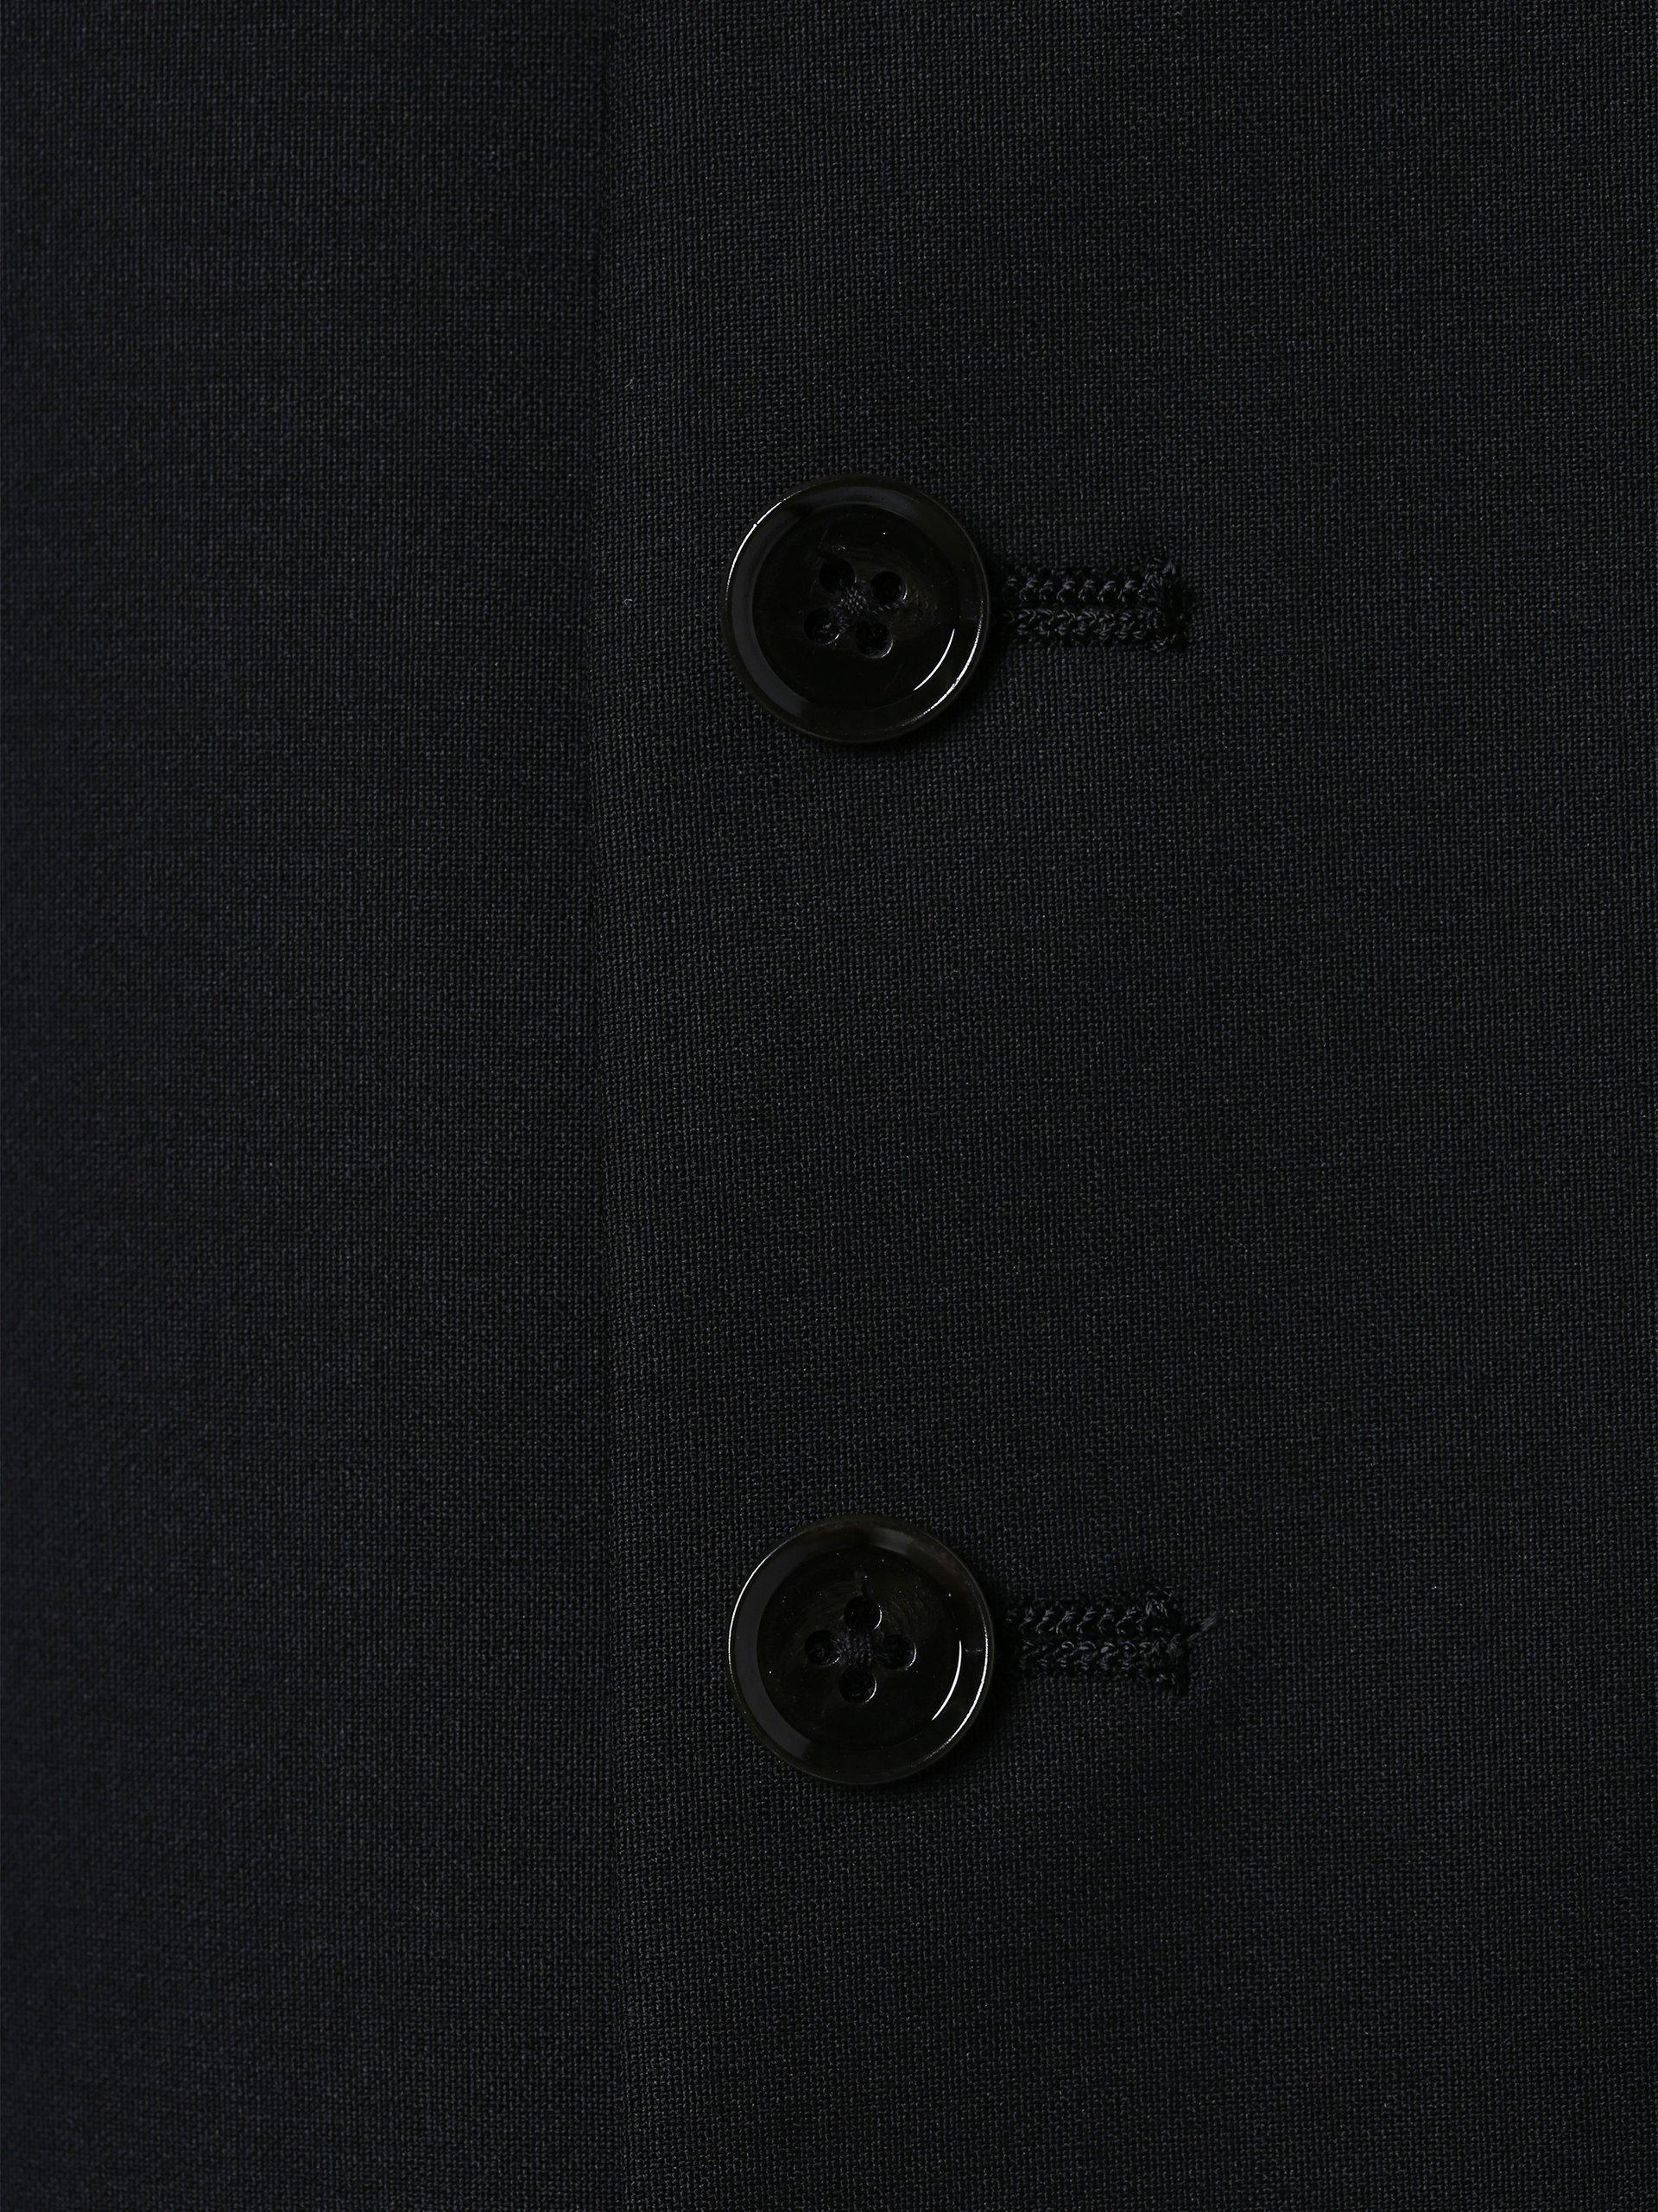 Finshley & Harding Męska kamizelka od garnituru modułowego – Black Label